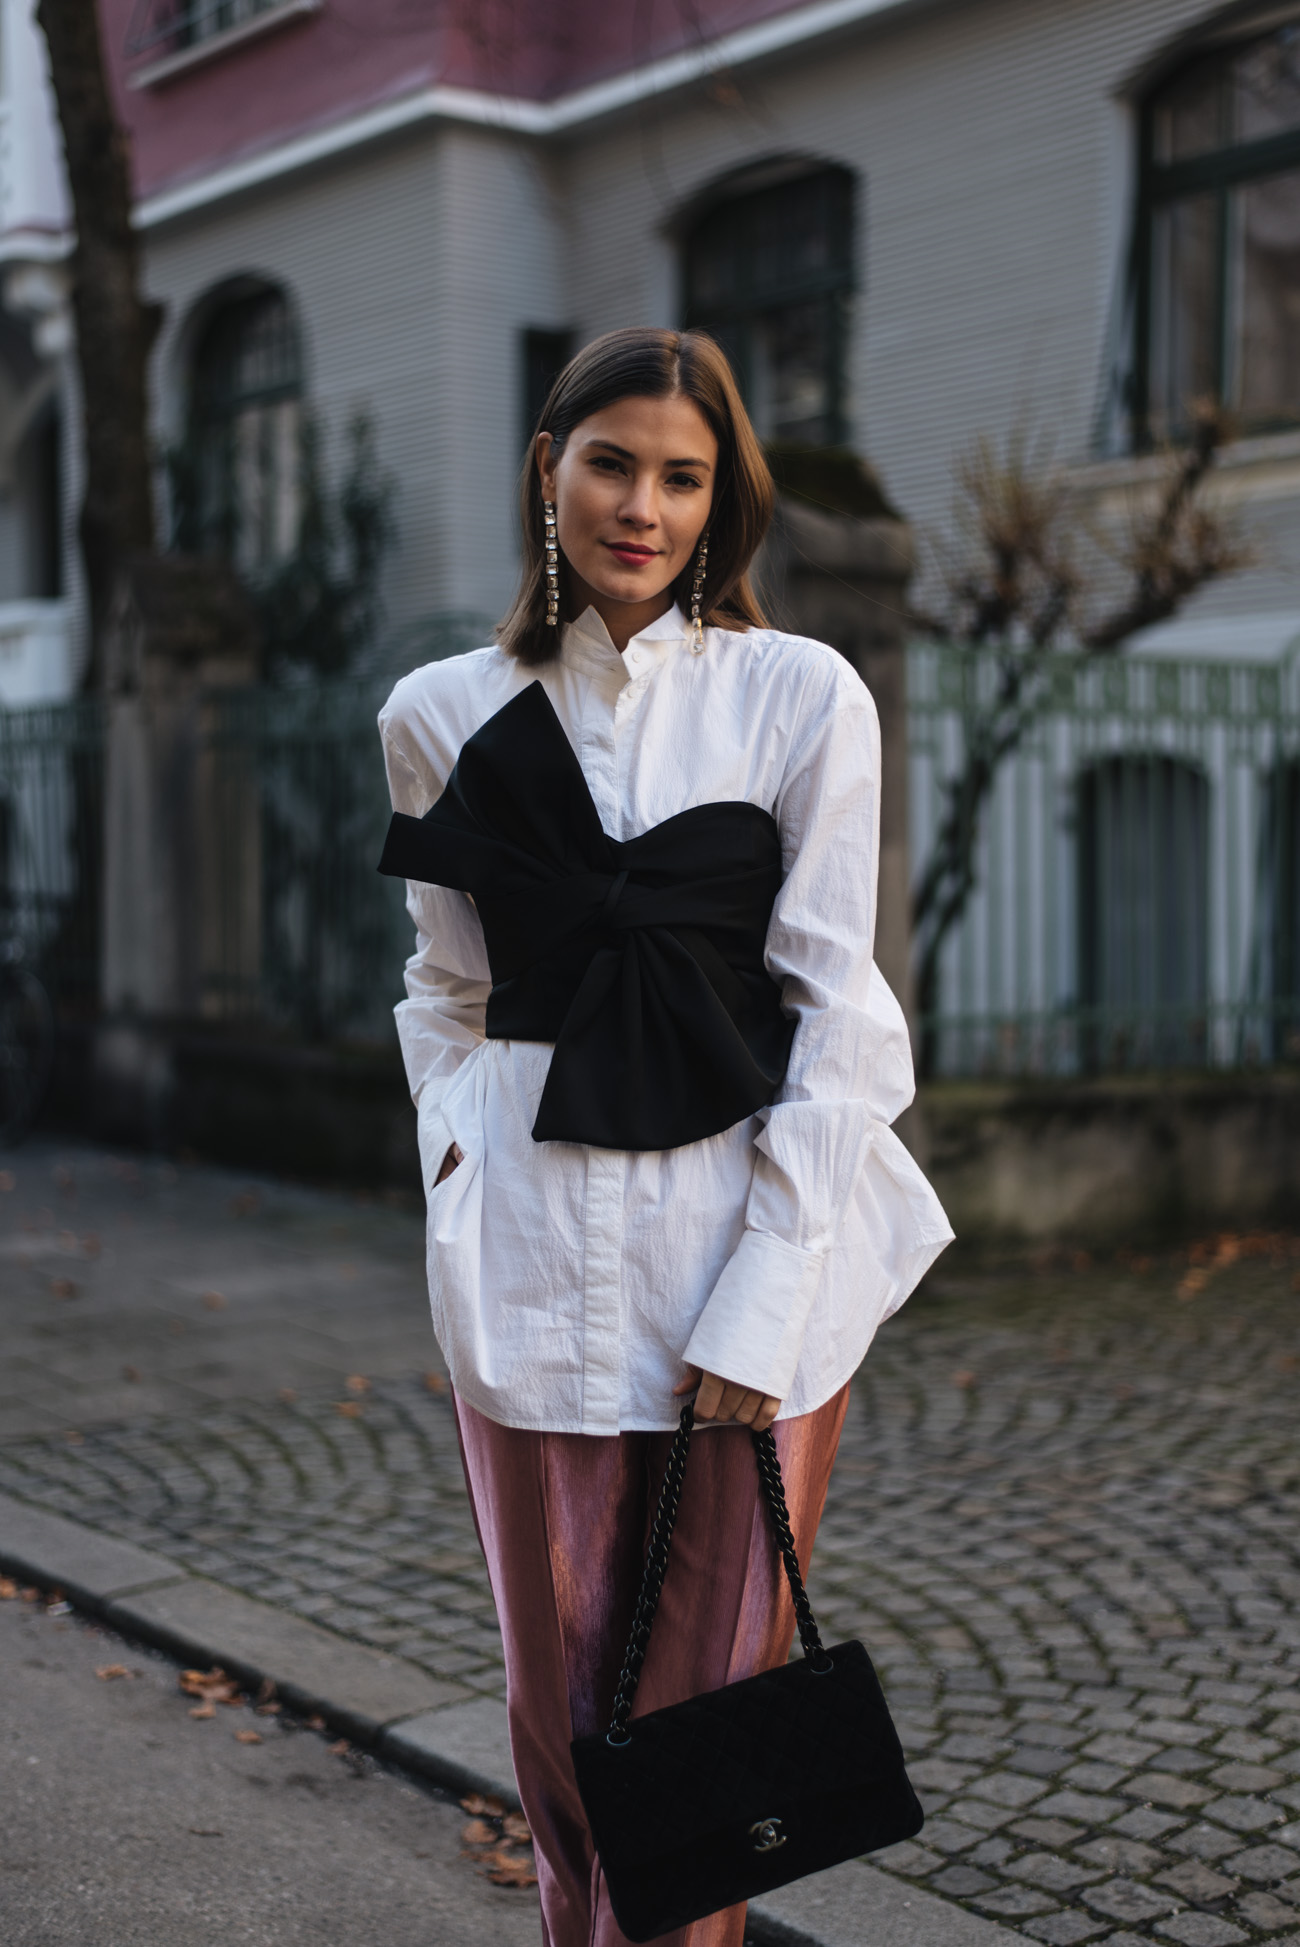 Haarschnitt-trends-2017-clavi-cut-german-fashion-beauty-lifesyle-blogger-influencer-high-end-luxury-nina-schwichtenberg-fashiioncarpet